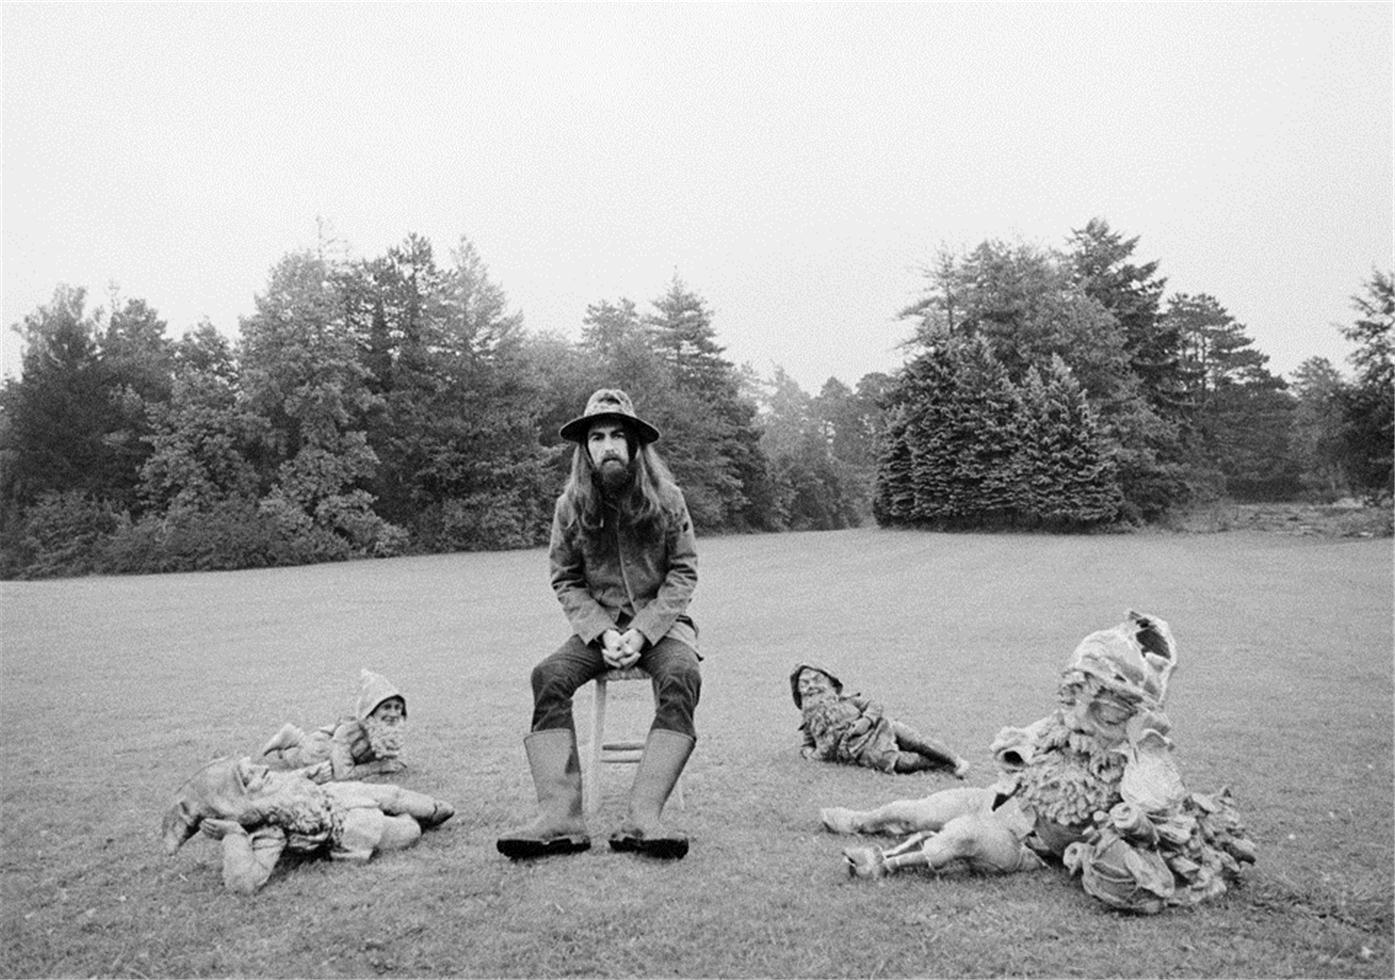 1970. Джордж Харрисон